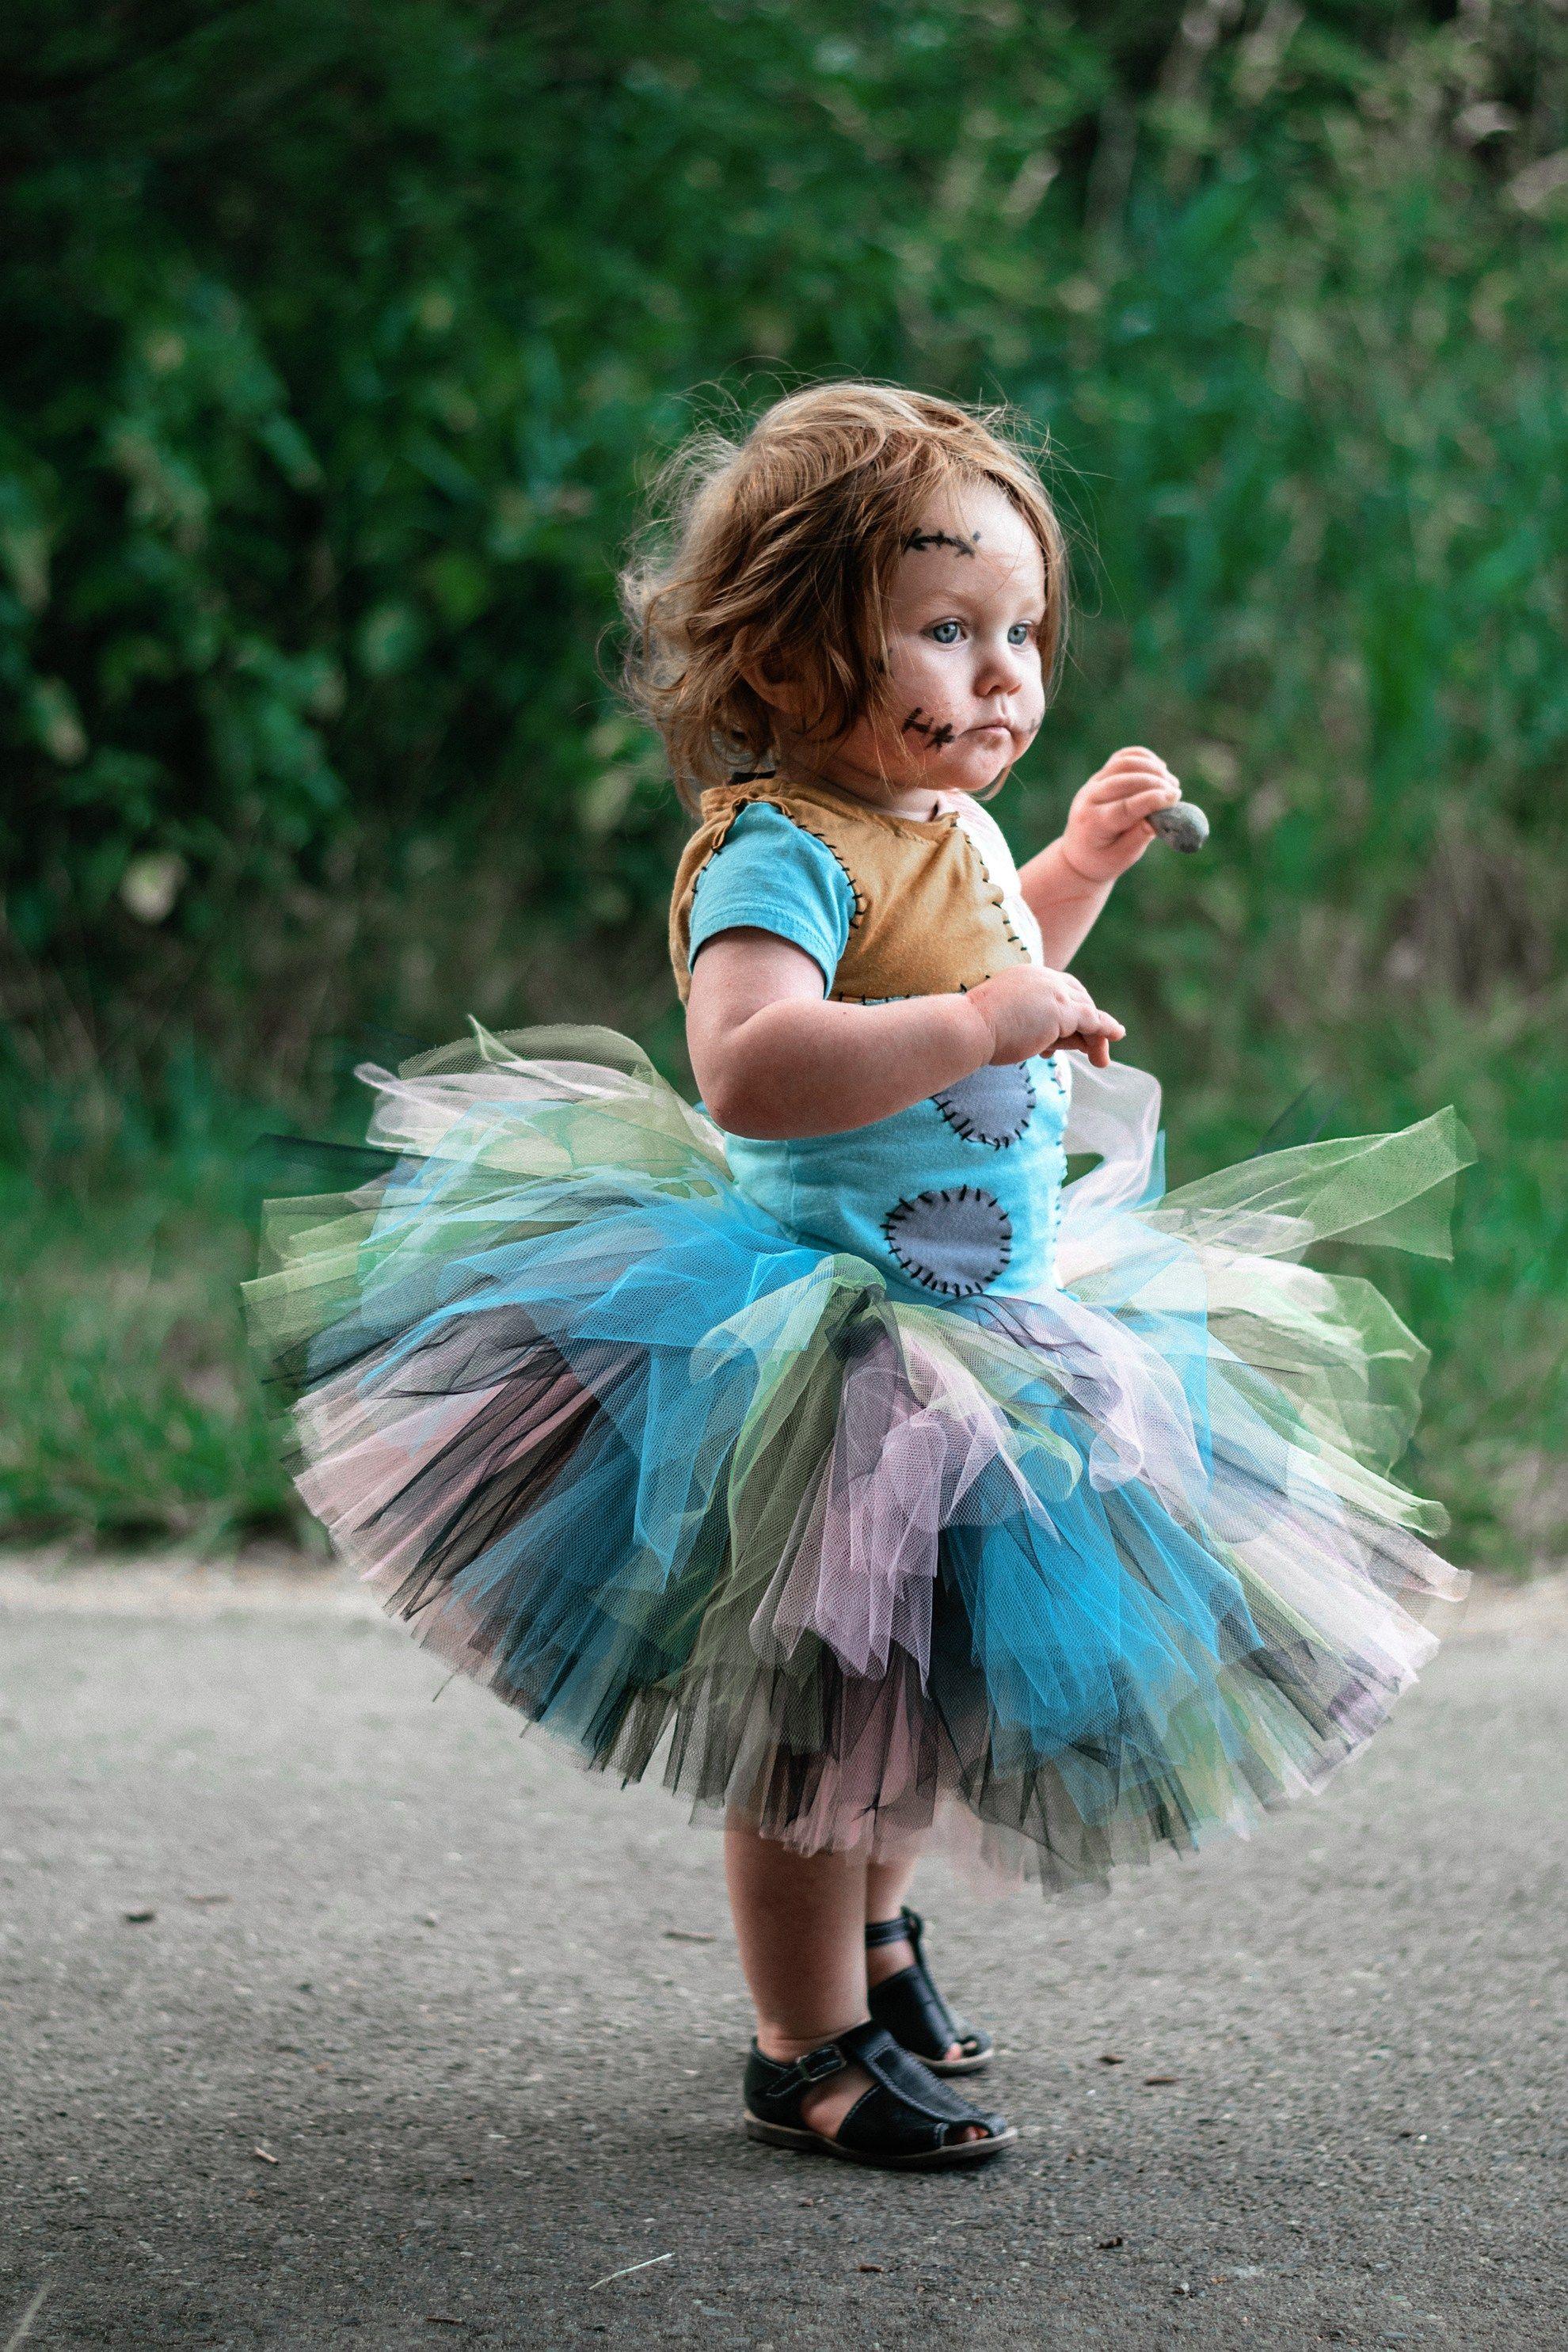 8 Halloween Costume Ideas For Toddlers | Kids Corner | Pinterest ...